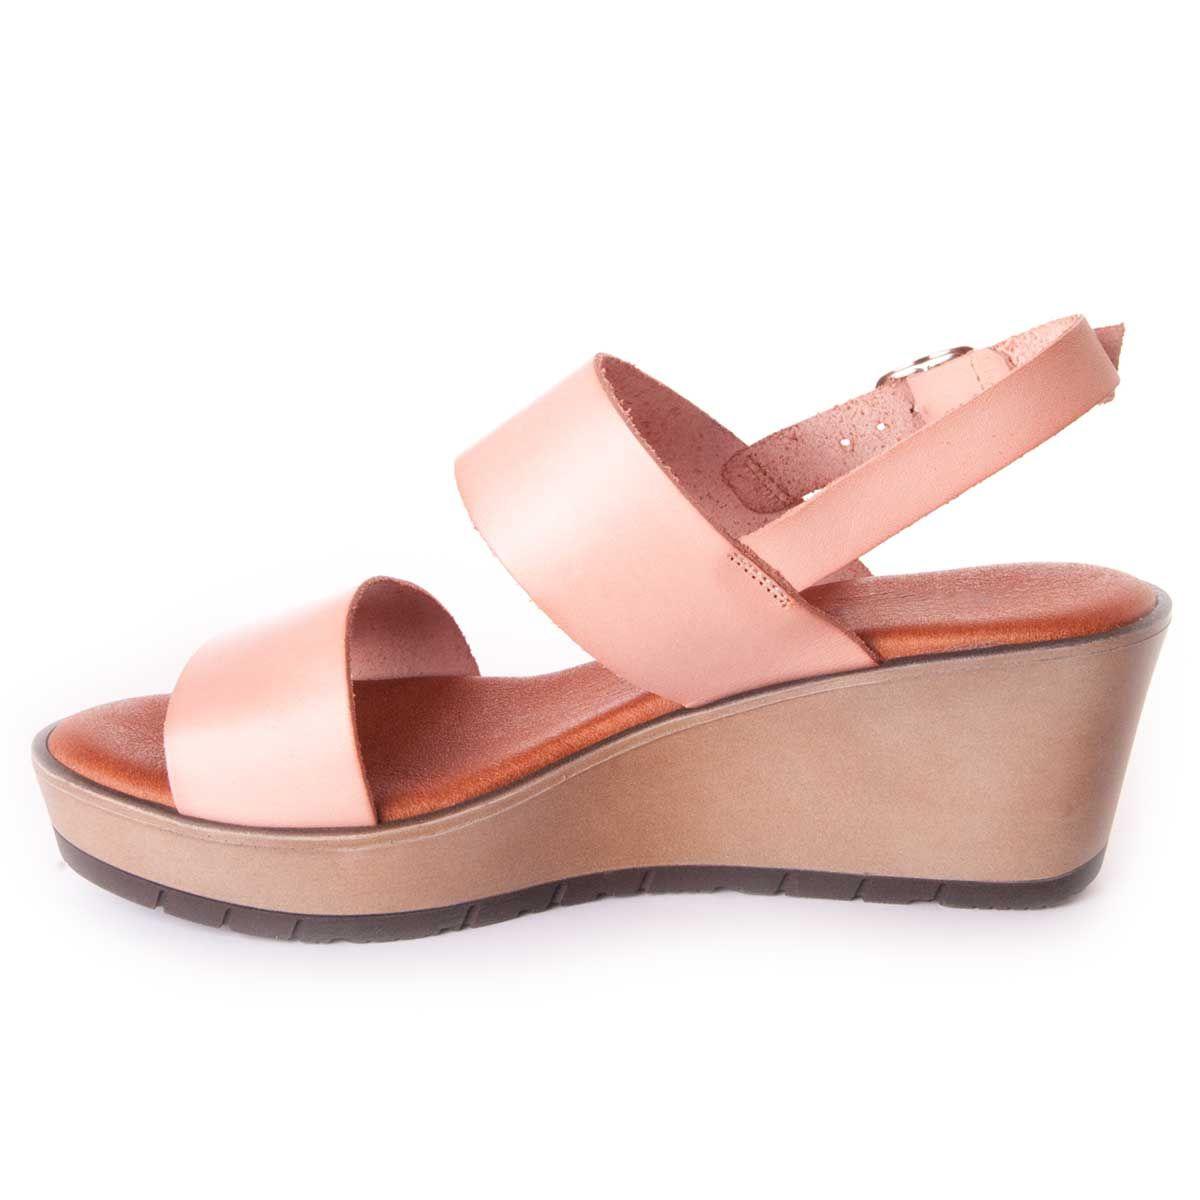 Leindia Wedge Sandal in Nude